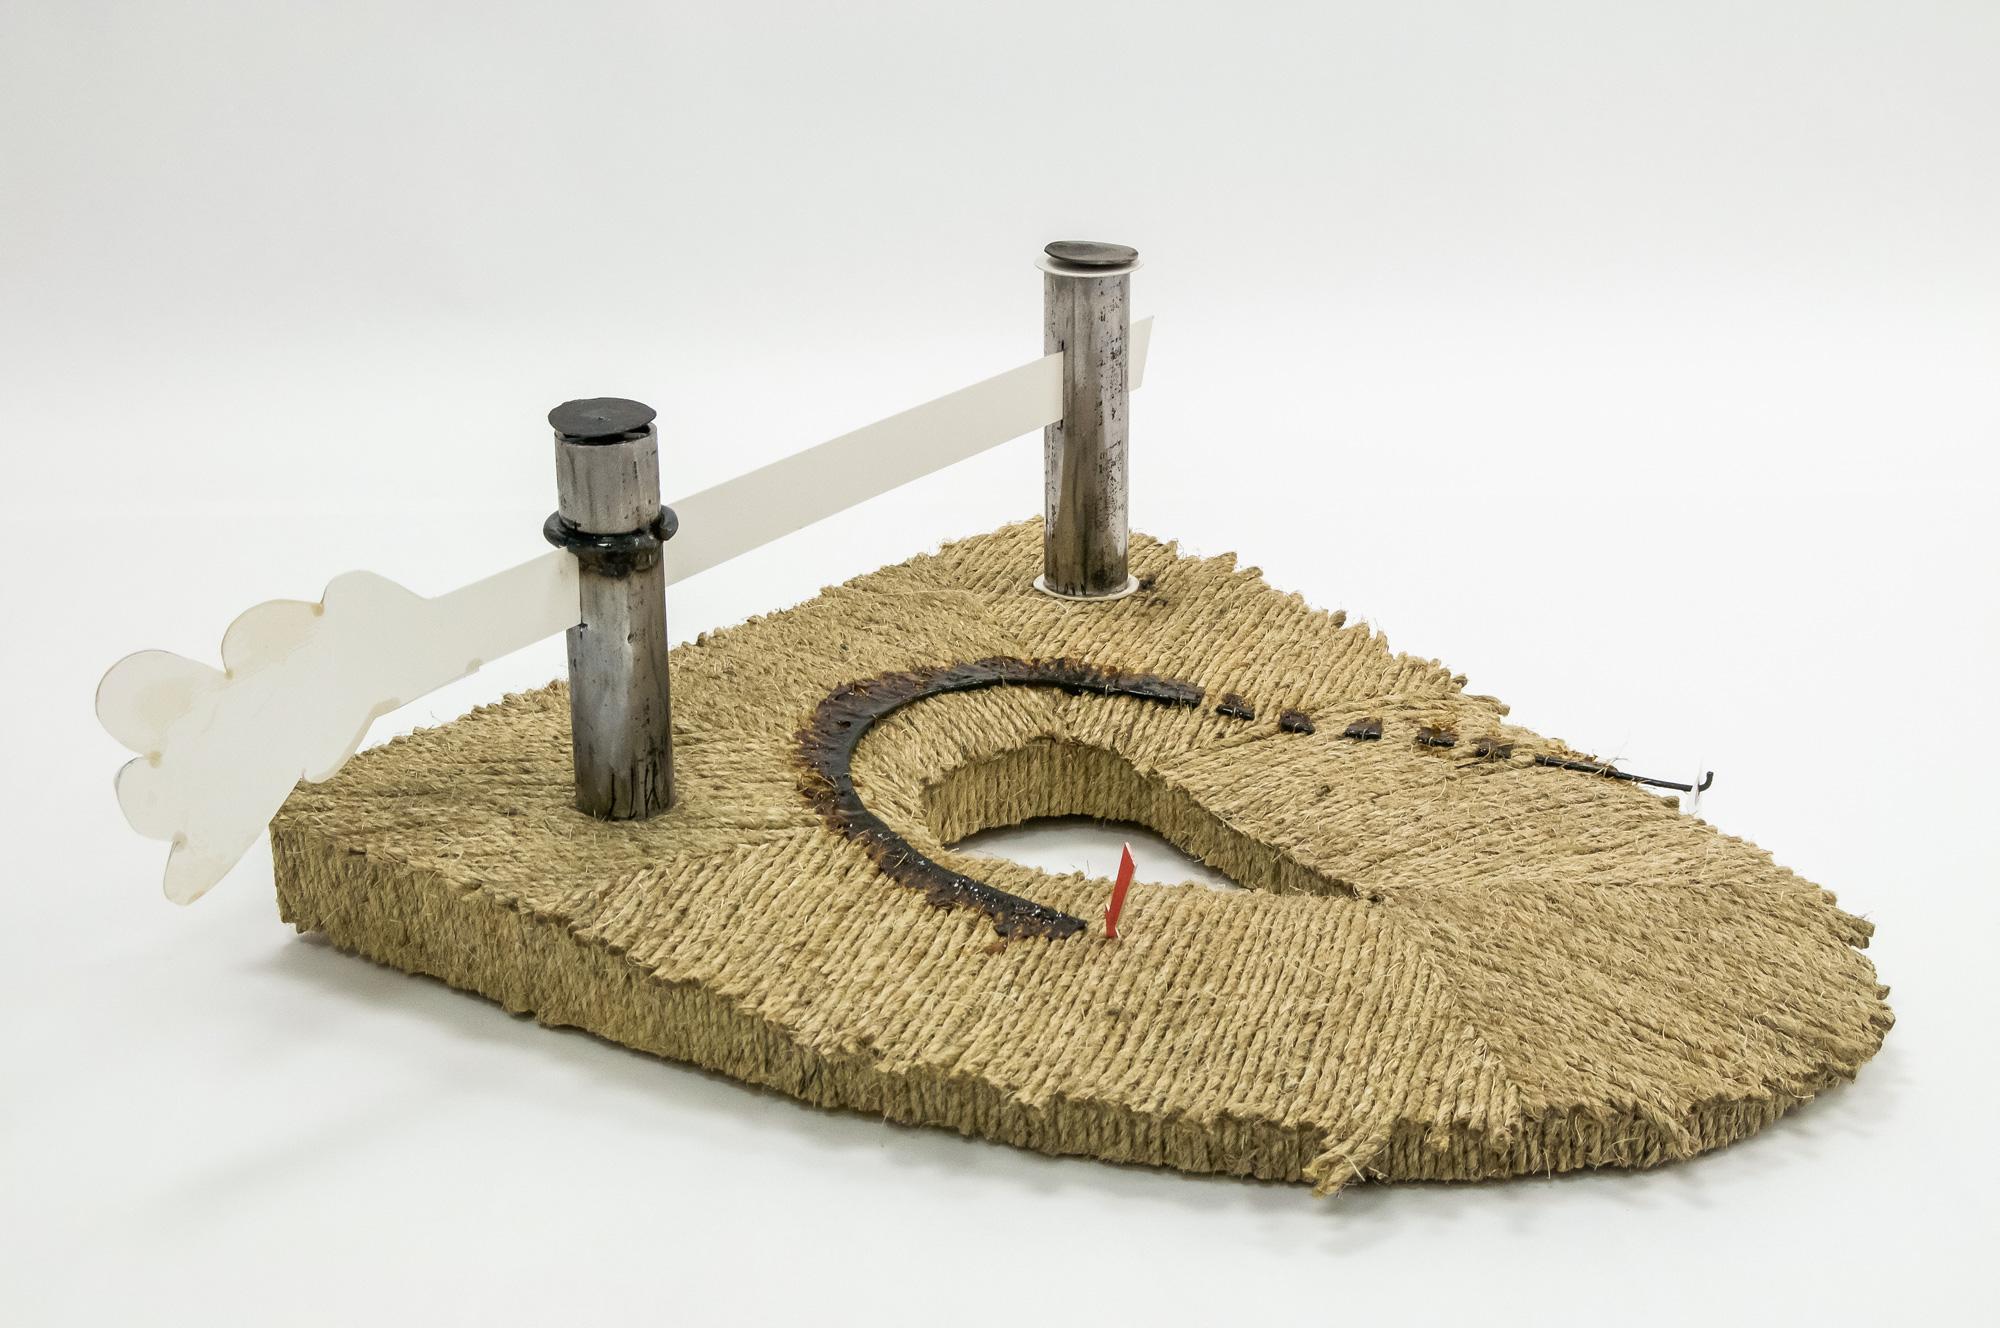 TOR (Plan)  │ metal, wood, plastic, cardboard, fabric │ 2020 │ 30cm x 78cm x 75cm